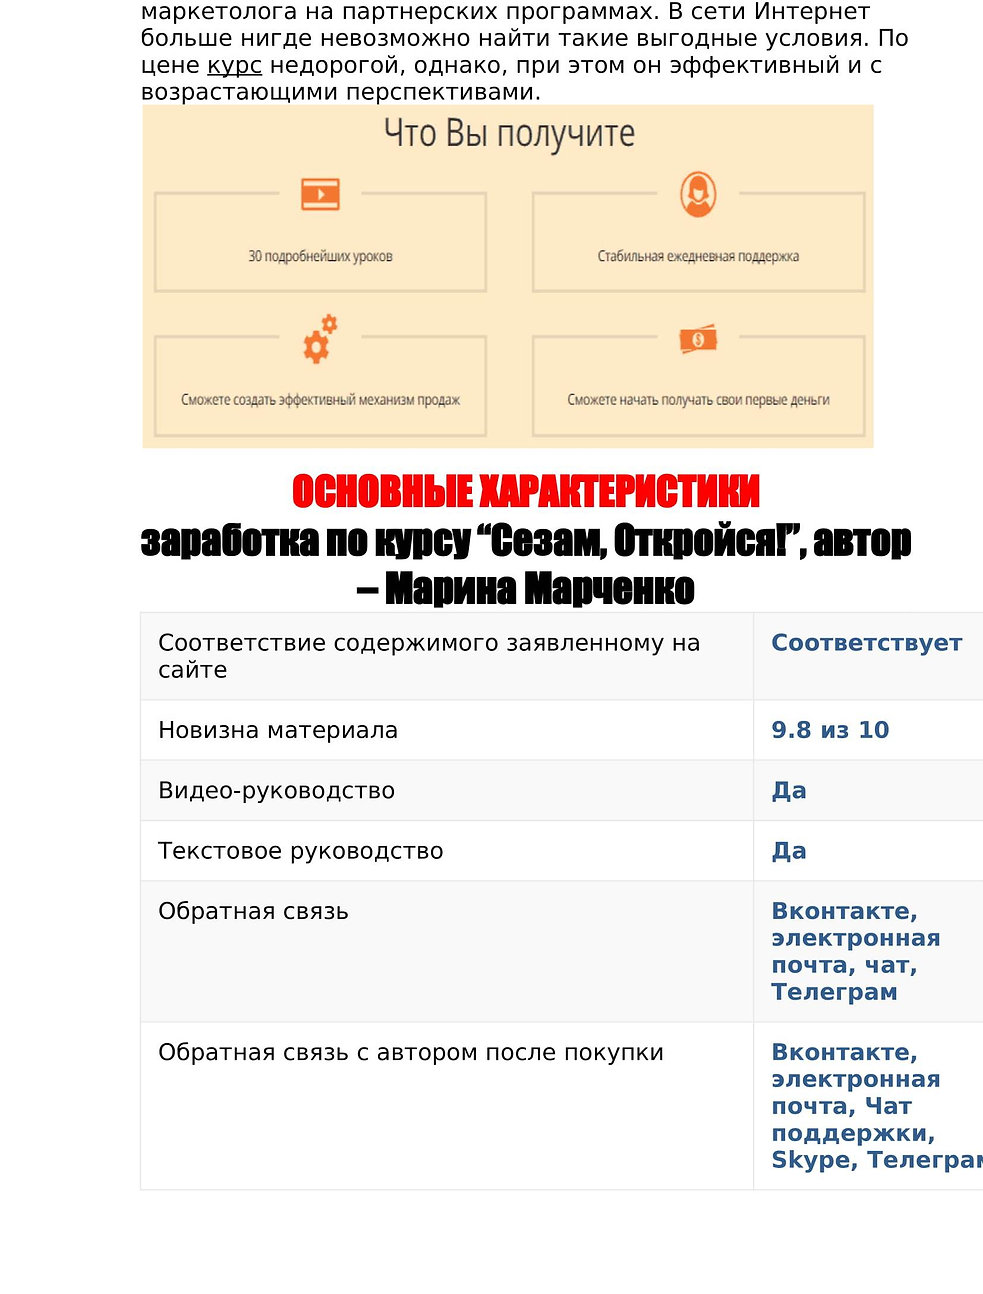 СезамОткройся (8).jpg